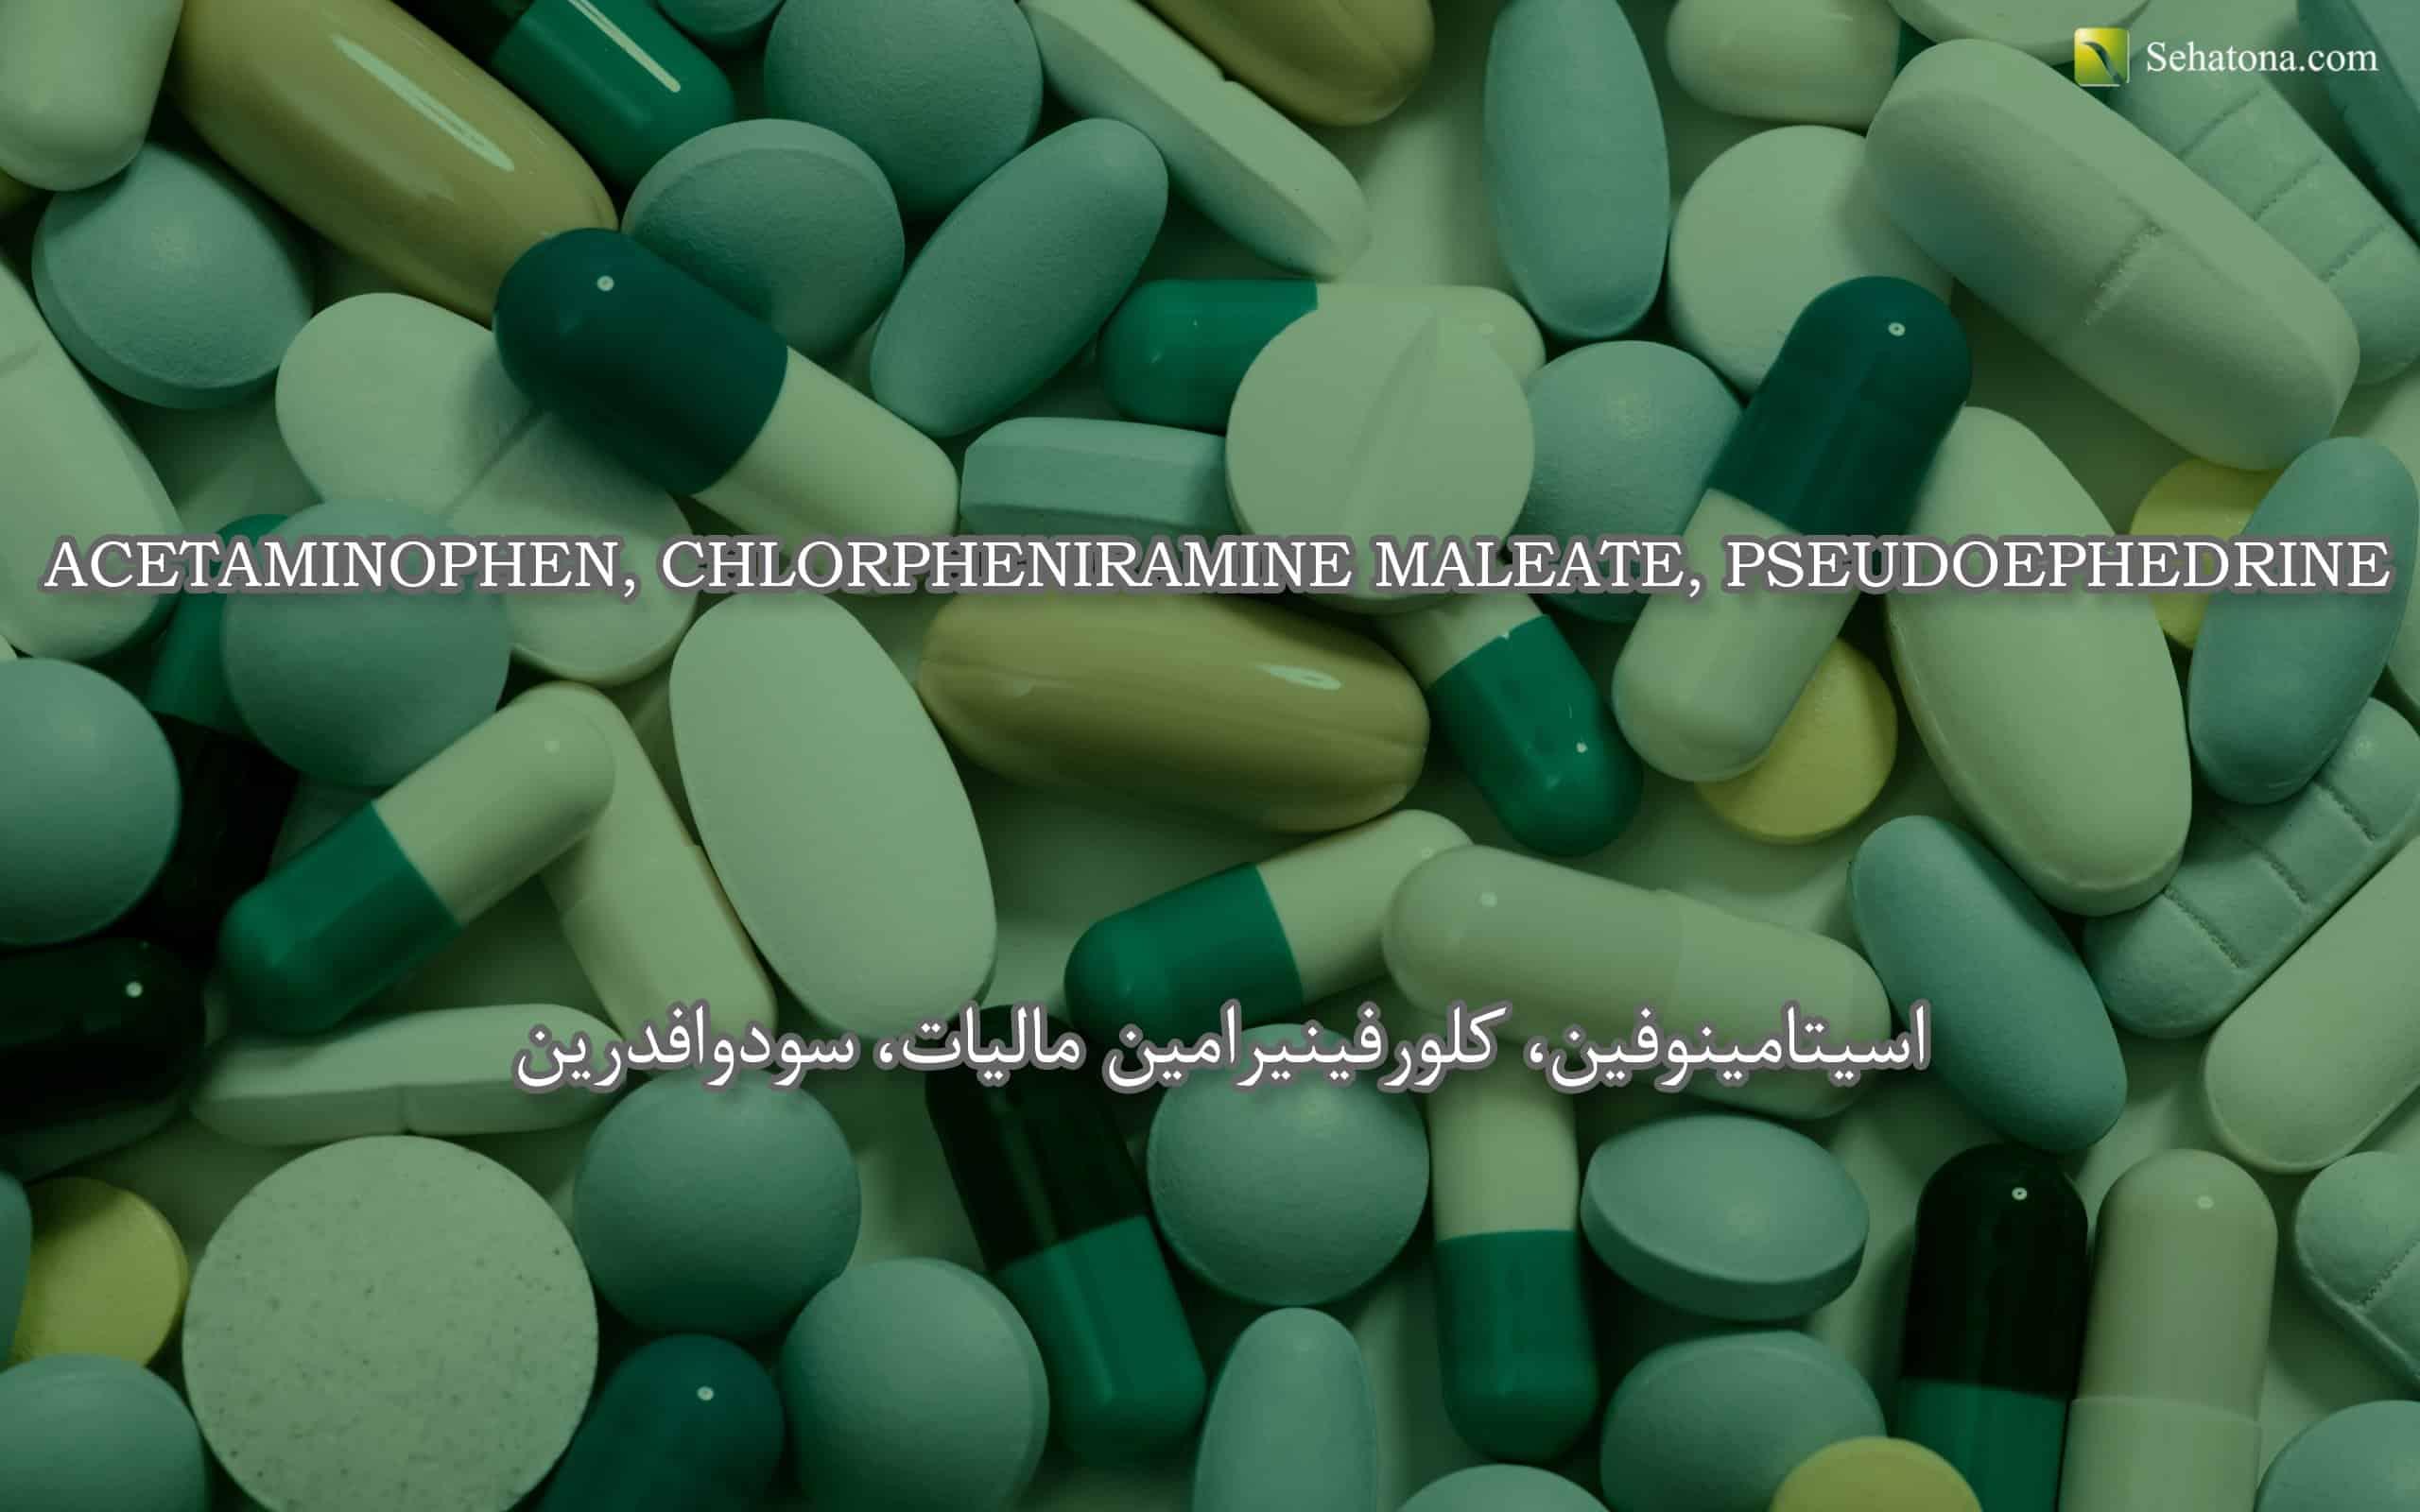 Acetaminophen, chlorphenamine maleate, Pseudoephedrine